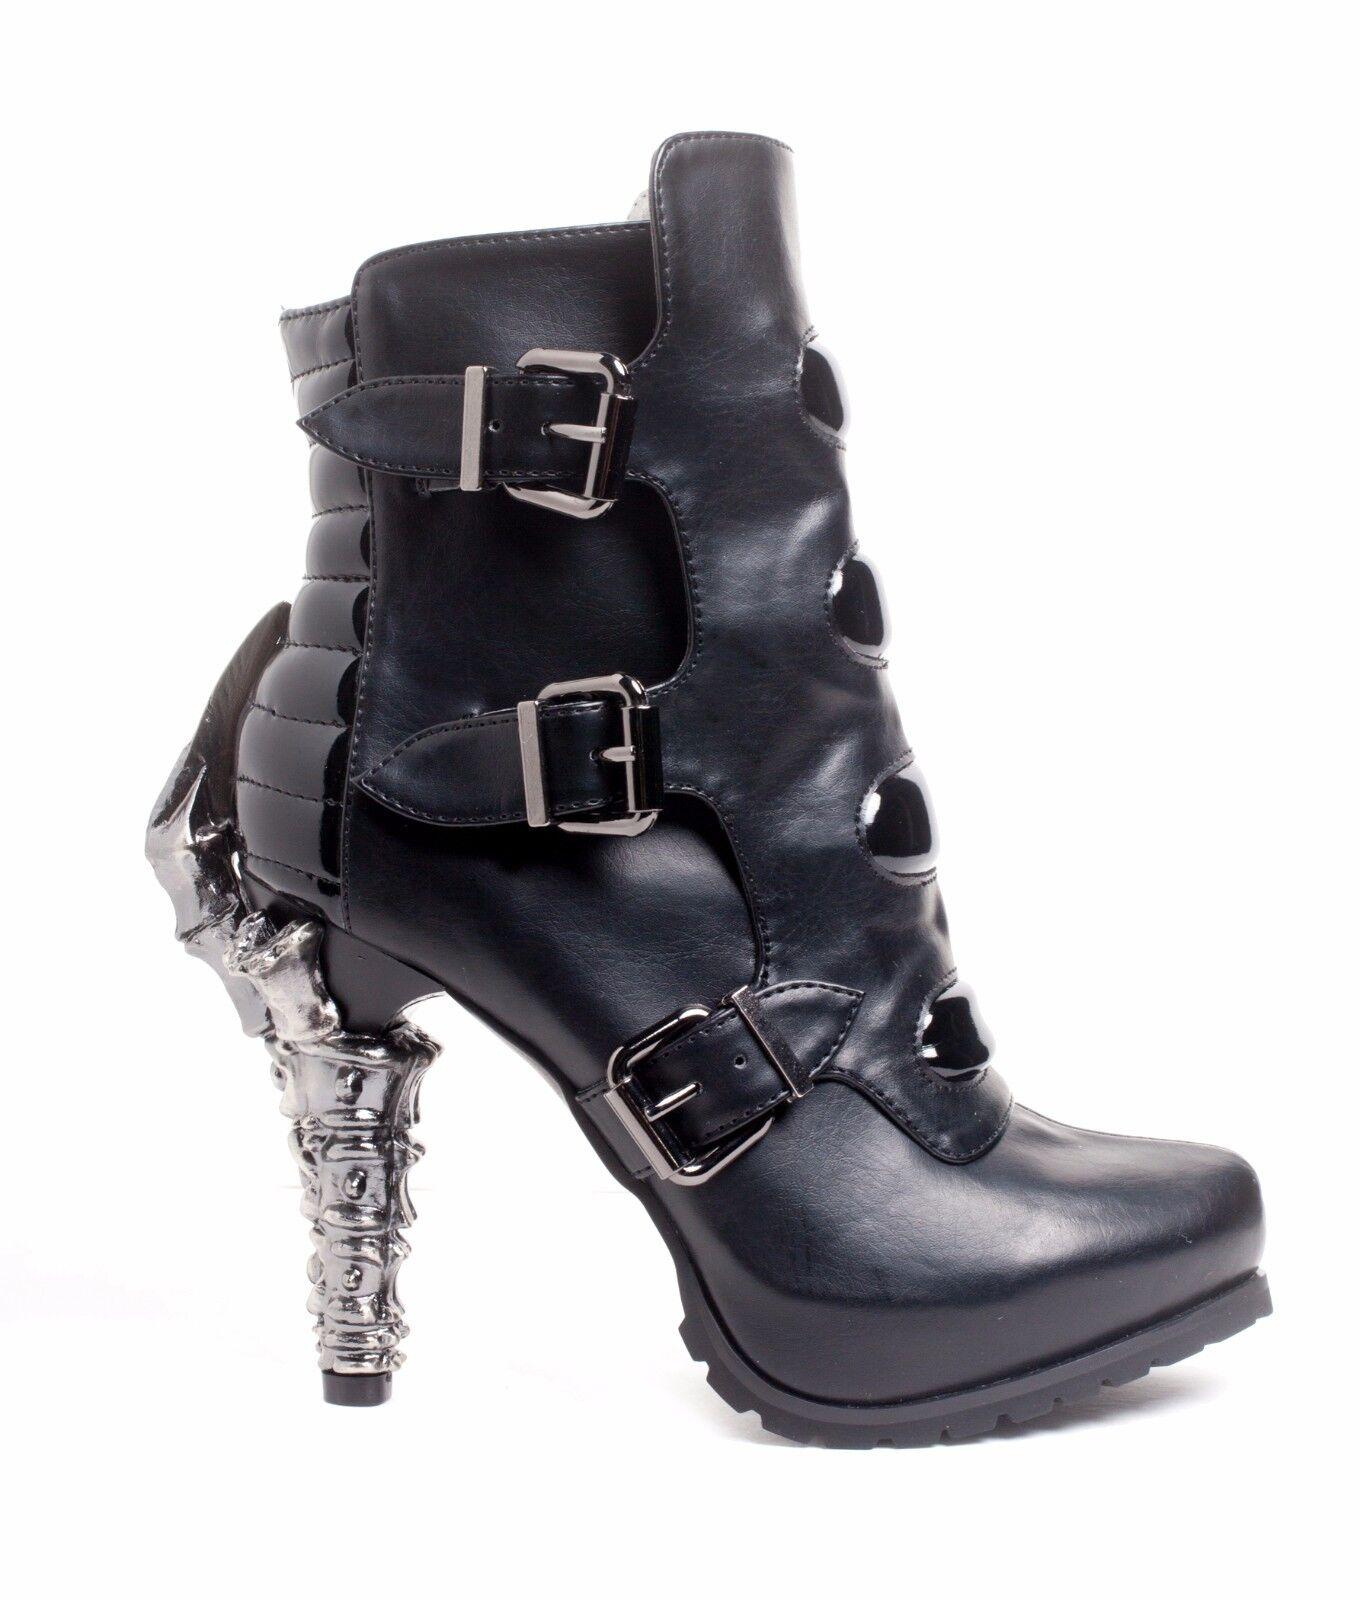 Hades NEO Steampunk Cyber Talon Claw Heel Alternative Goth Ankle Bootie Boots